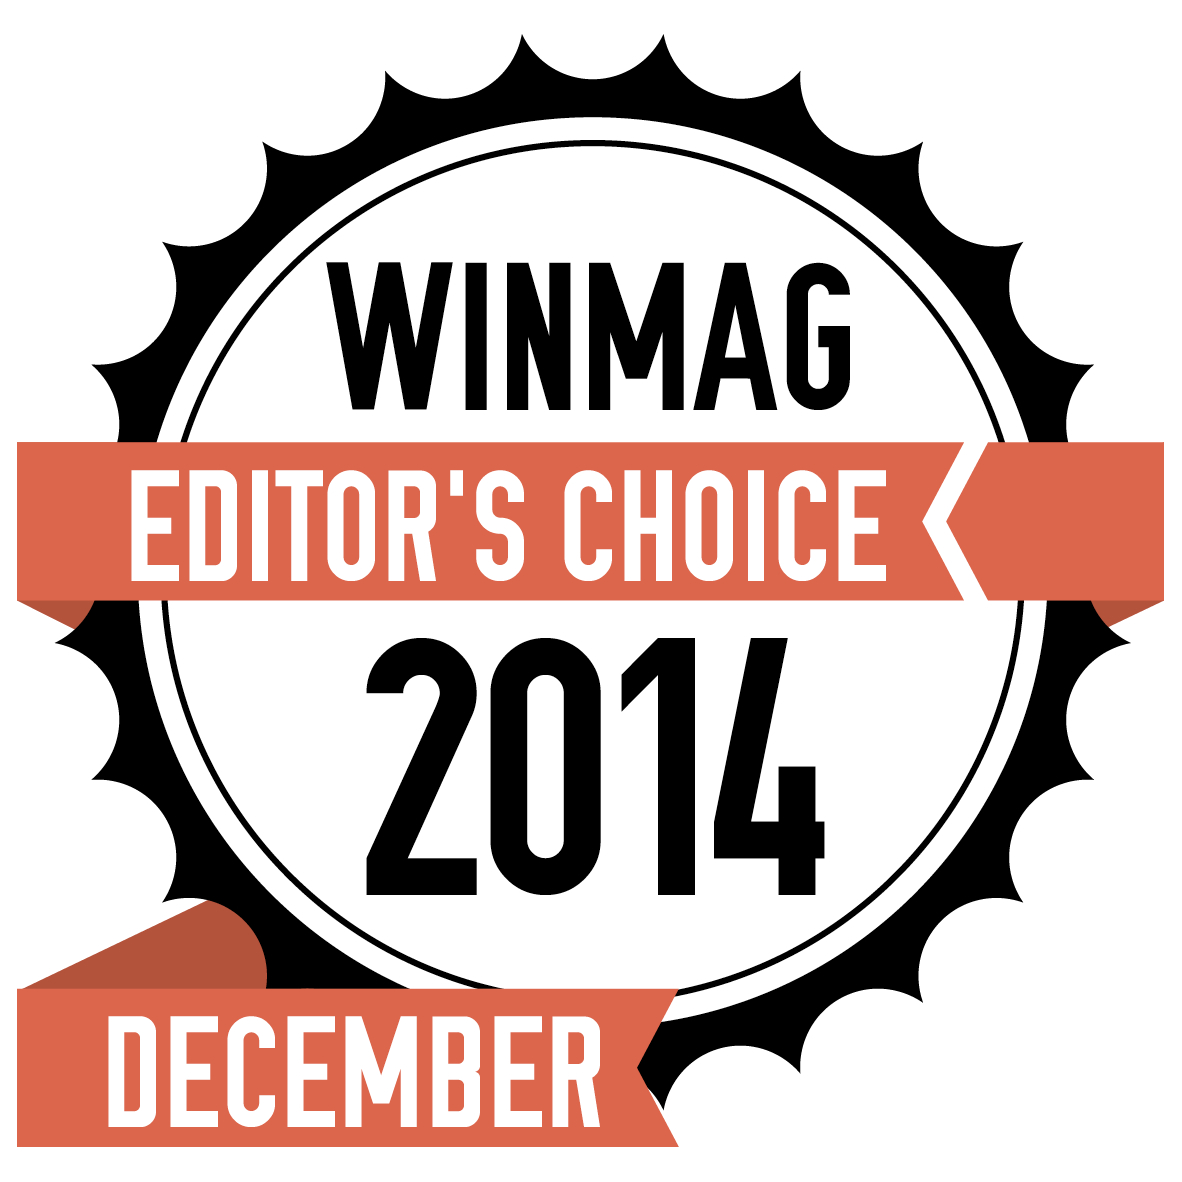 EditorsChoiceDECEMBER2014 (CR10iNG bags Winmag Editor's choice Award December 2014, Netherlands)